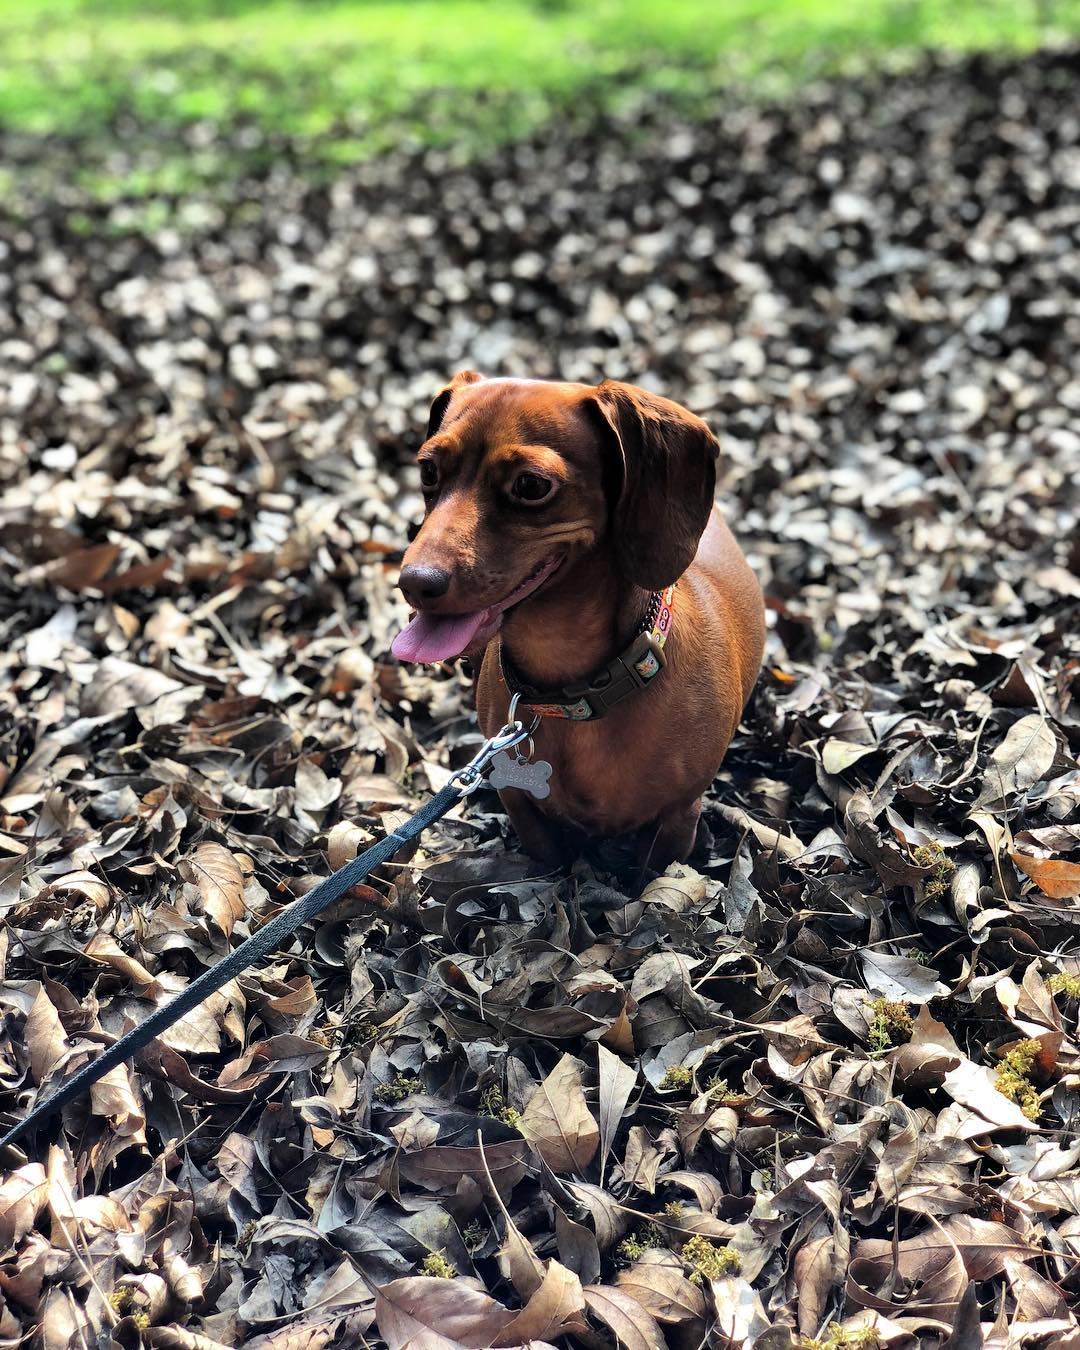 Mila the Dachshund